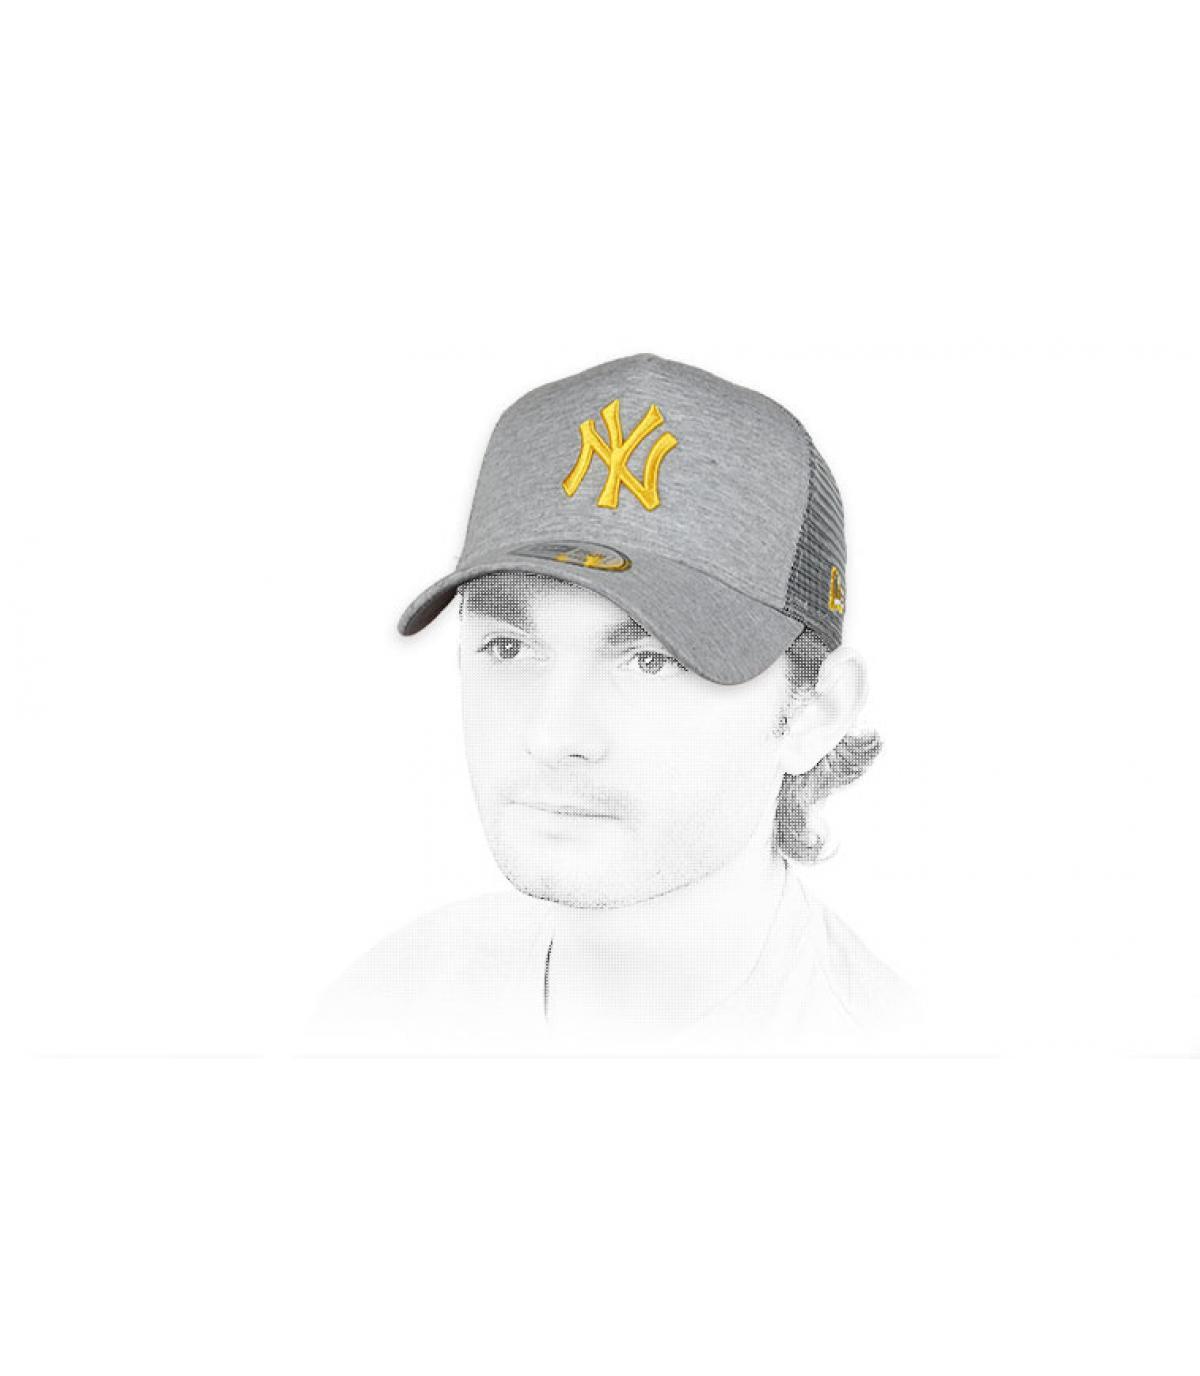 Trucker NY grau gelb